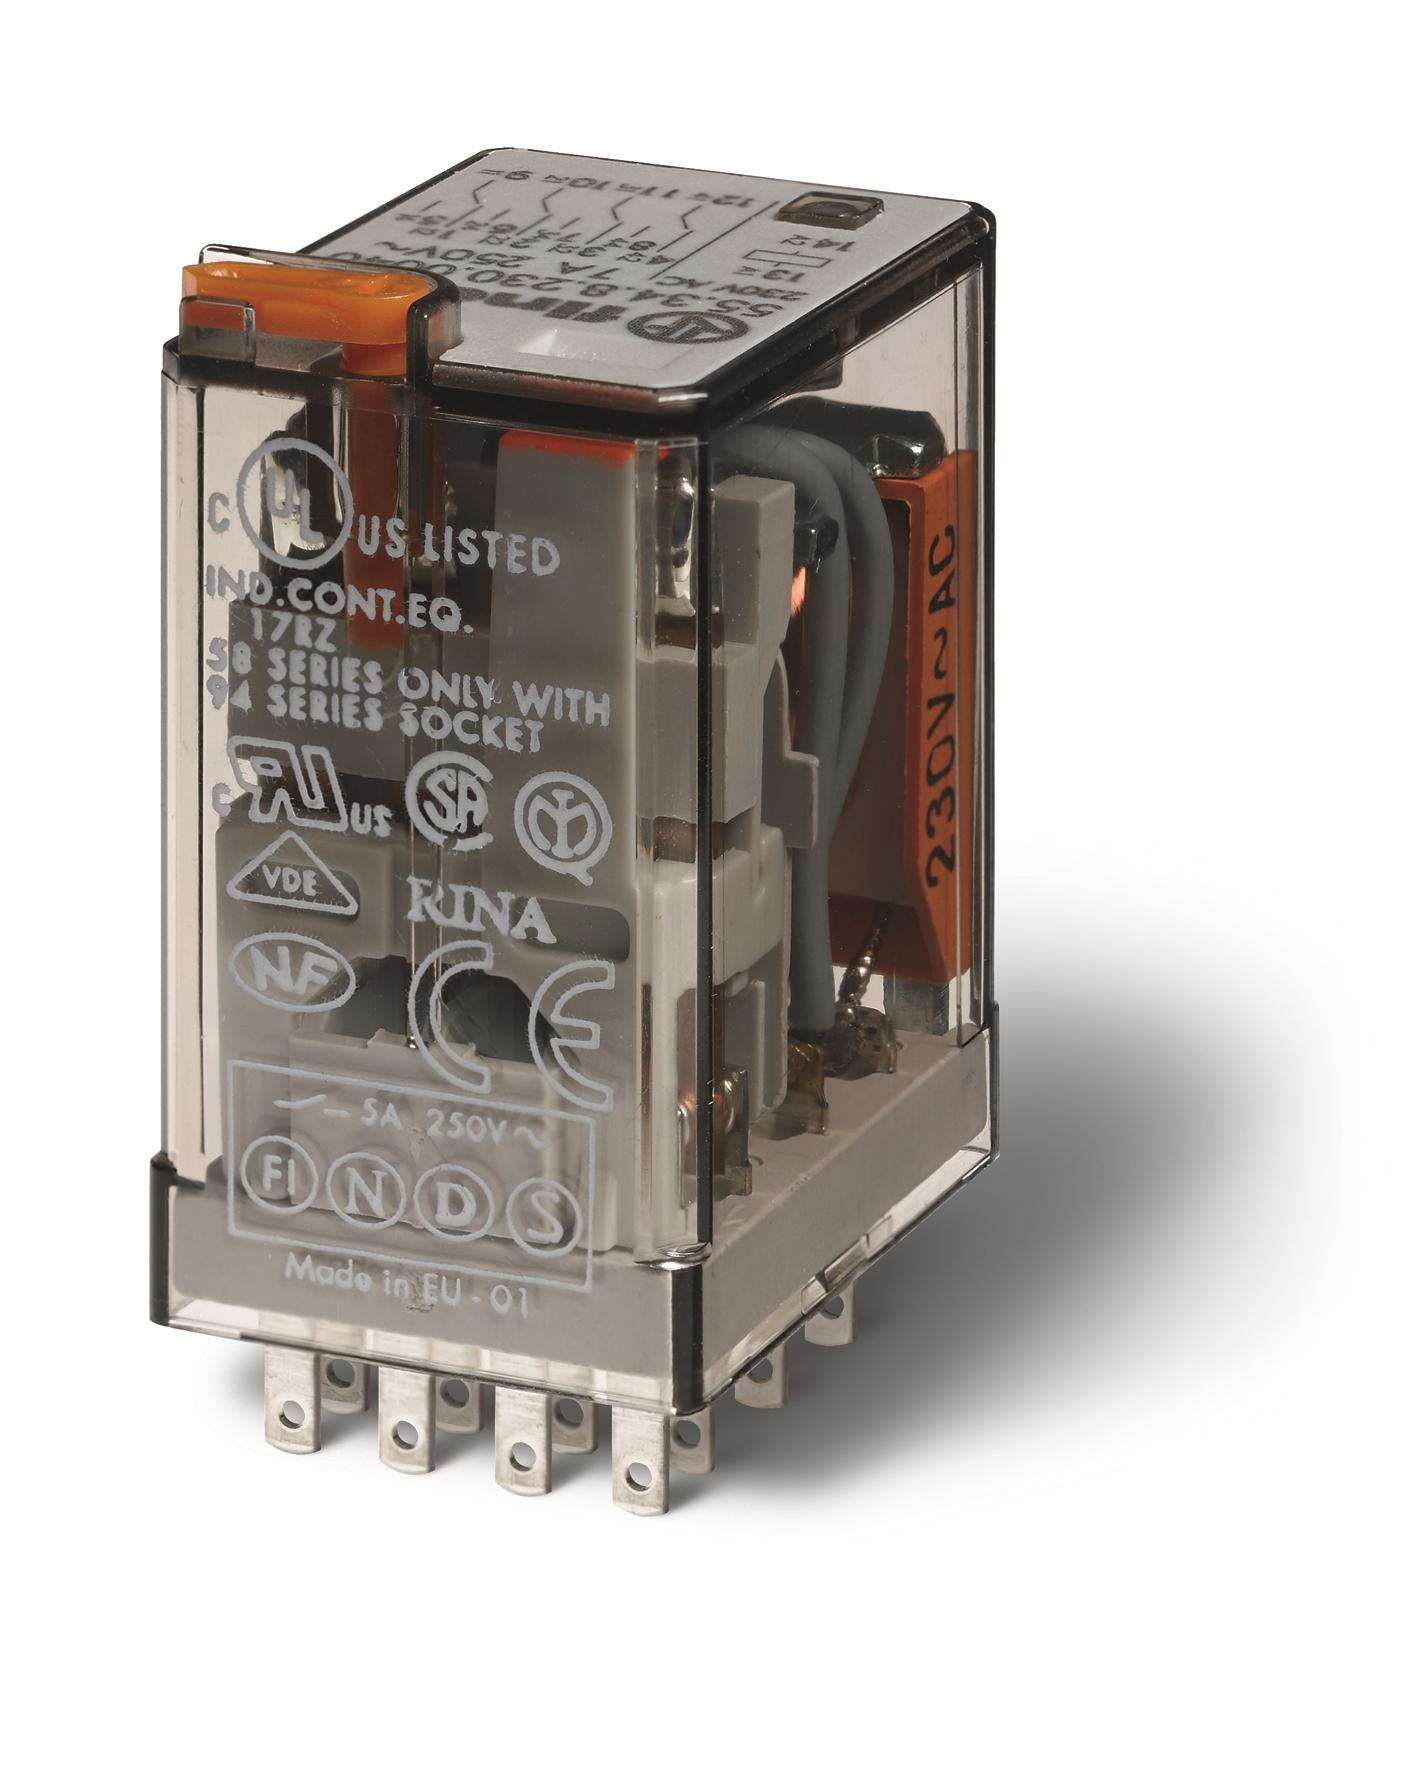 Image Description for https://tedi.itc-electronics.com/itcmedia/images/20190604/553480060040_FINDERRELAIS_1.jpg